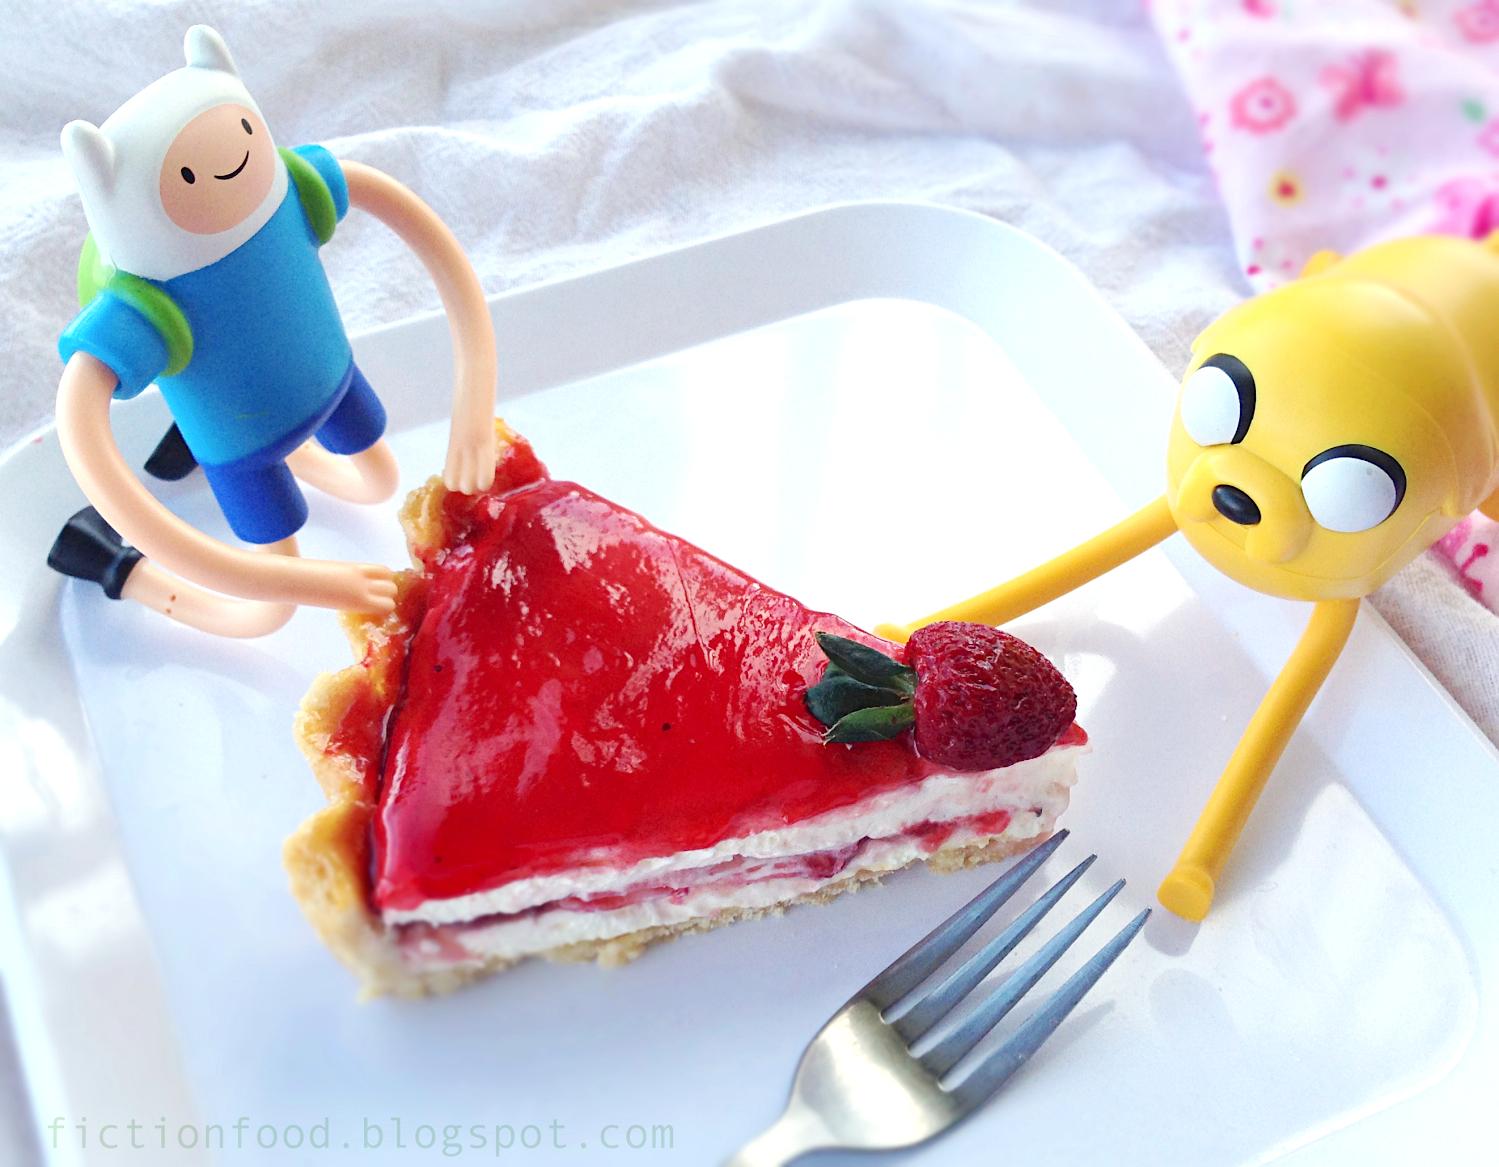 Fiction Food Cafe Royal Tart Adventure Time